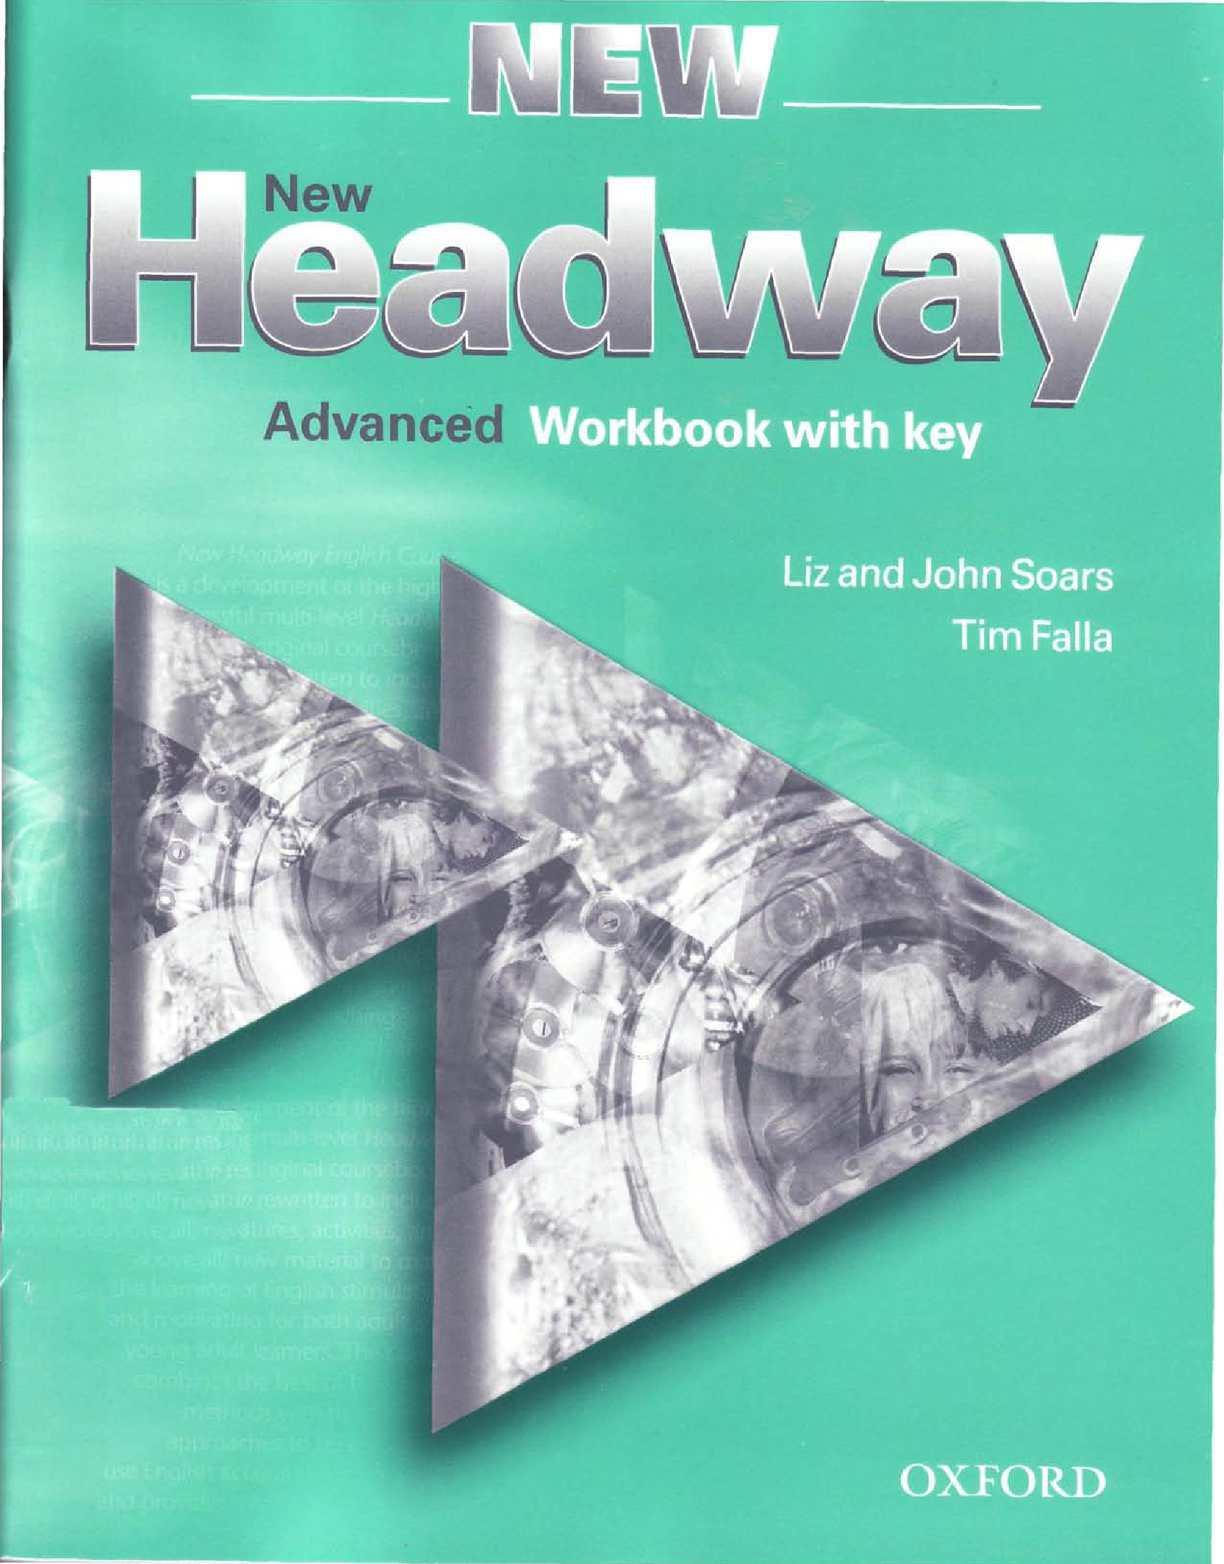 New Headway advanced - workbook